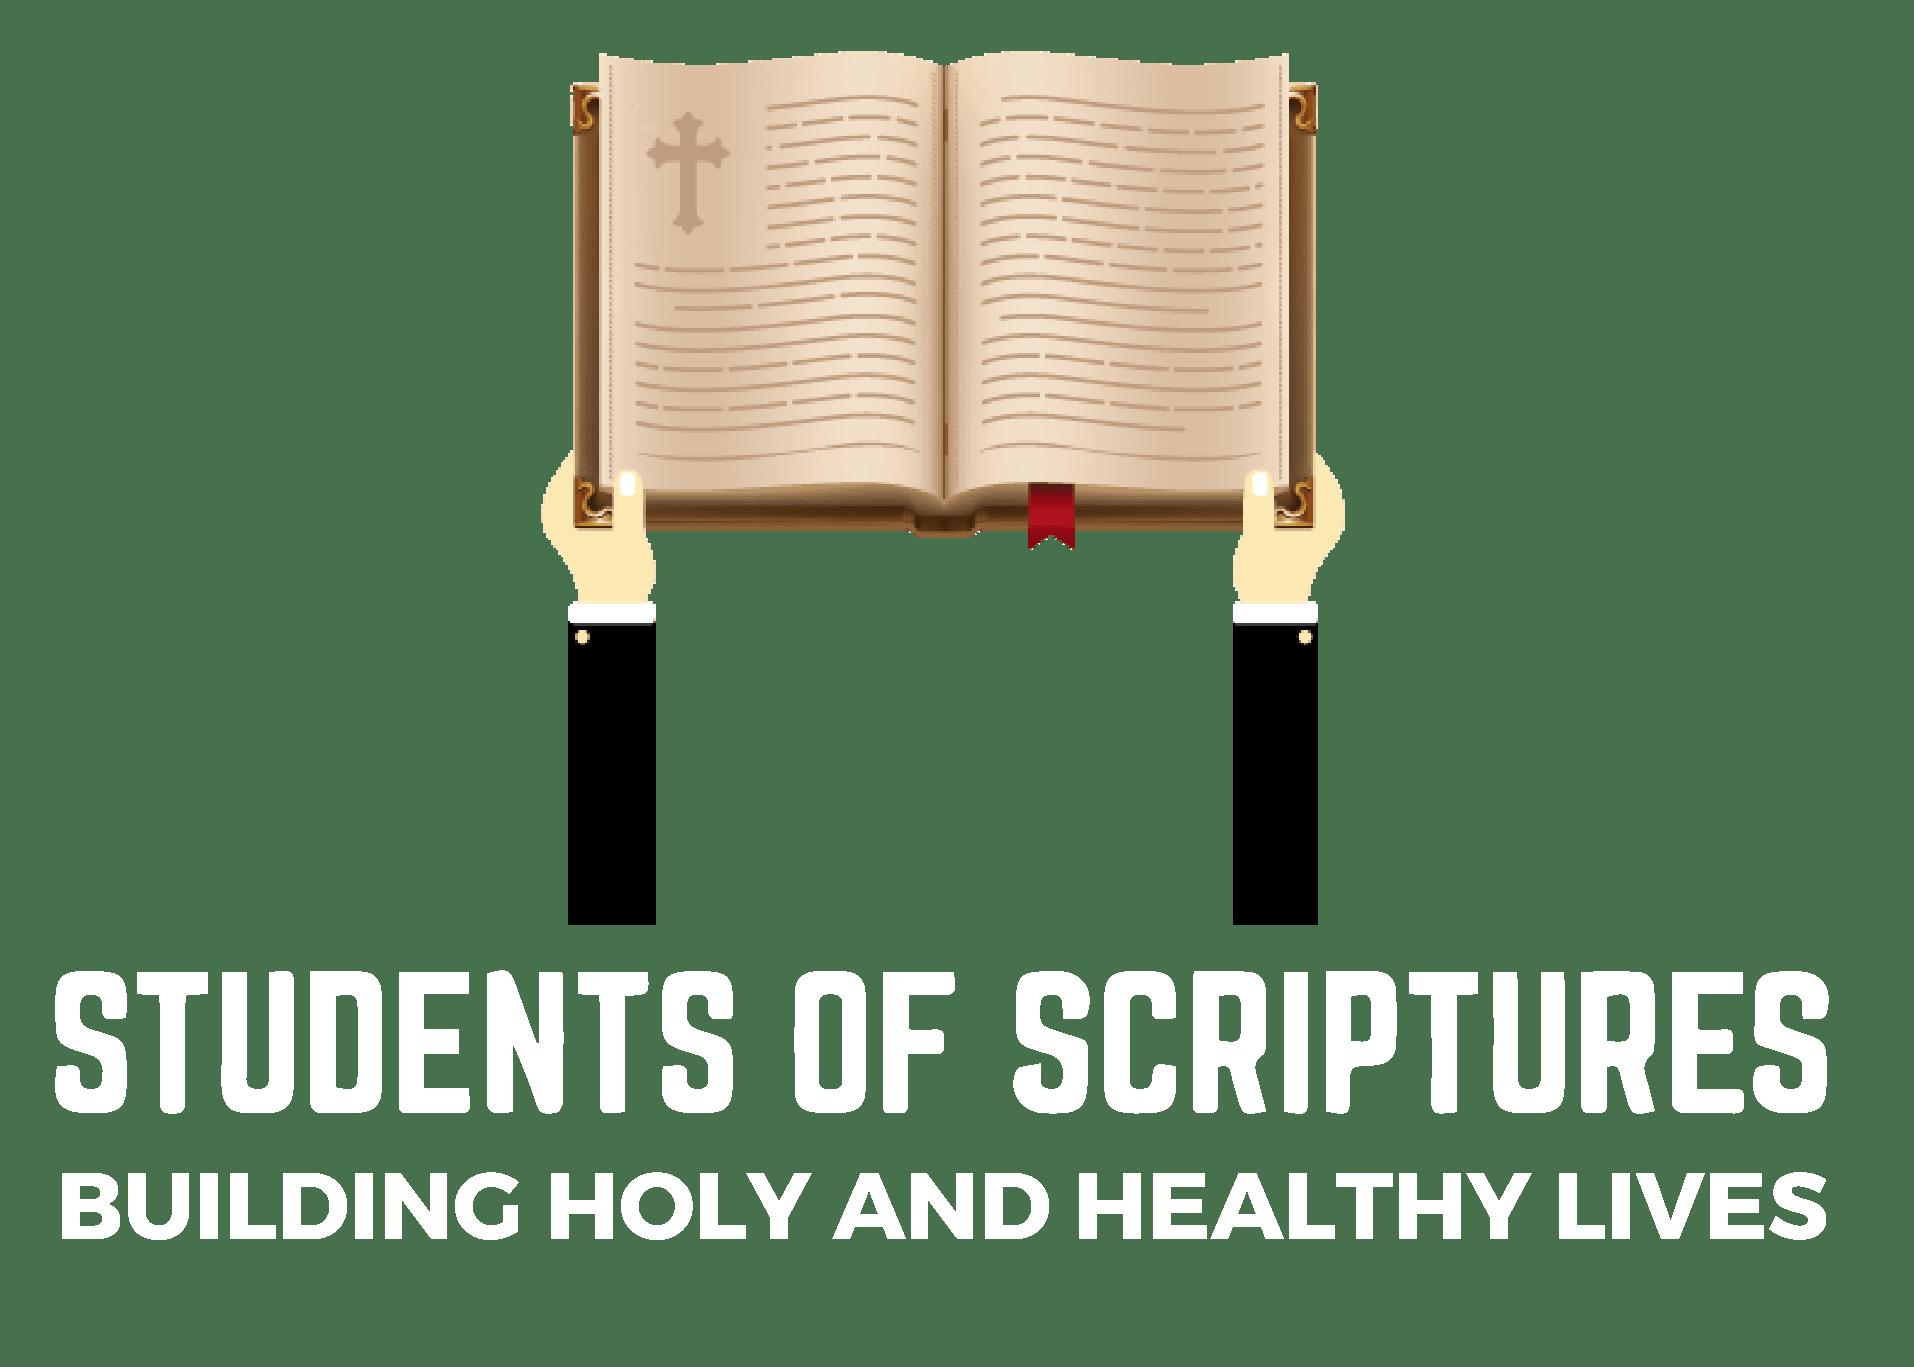 Students of Scriptures